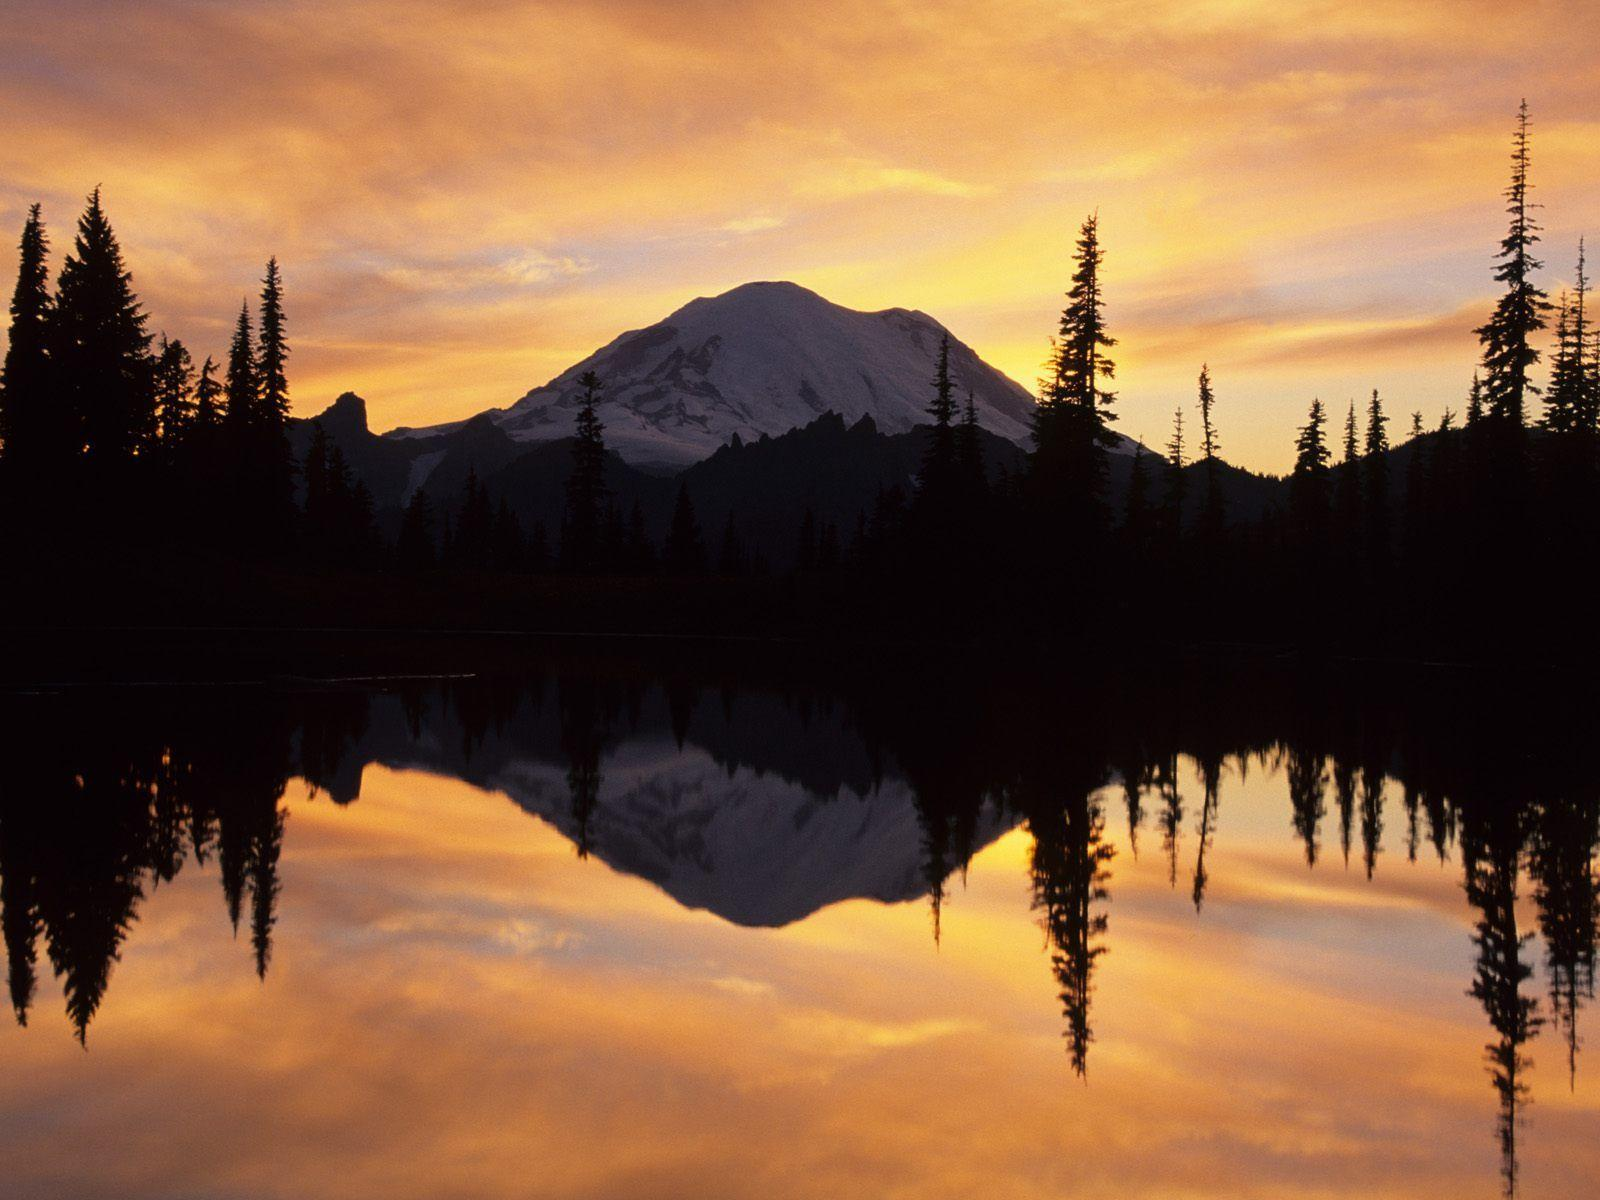 Mount Rainier National Park Wallpapers 1600x1200